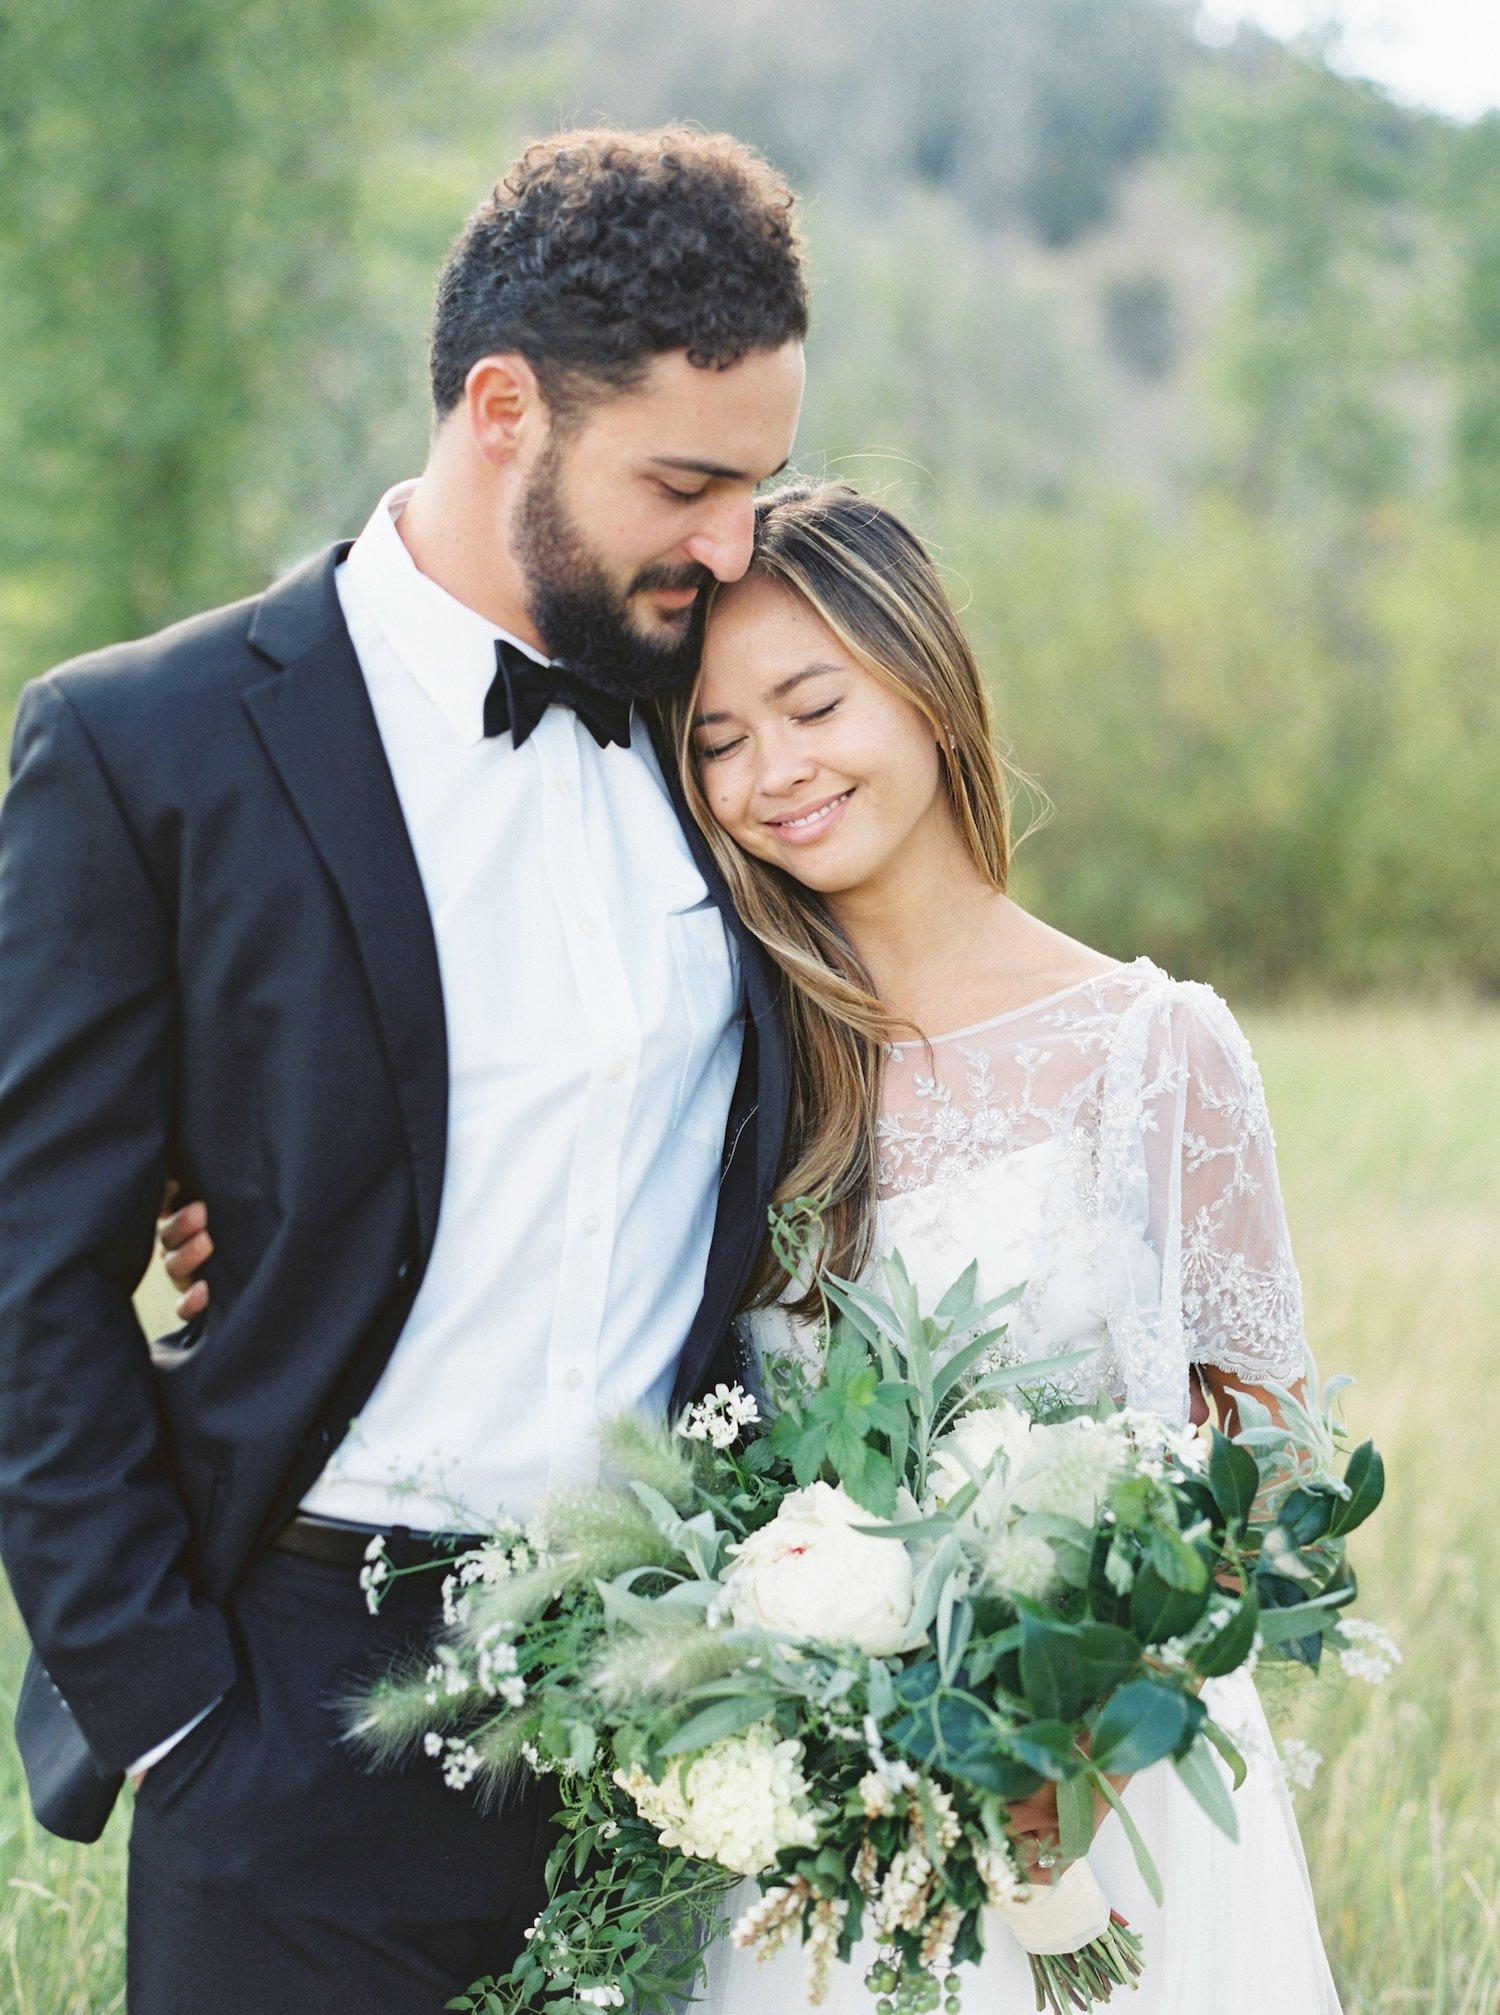 A bride rests her head against her groom's shoulder after a ranch elopement